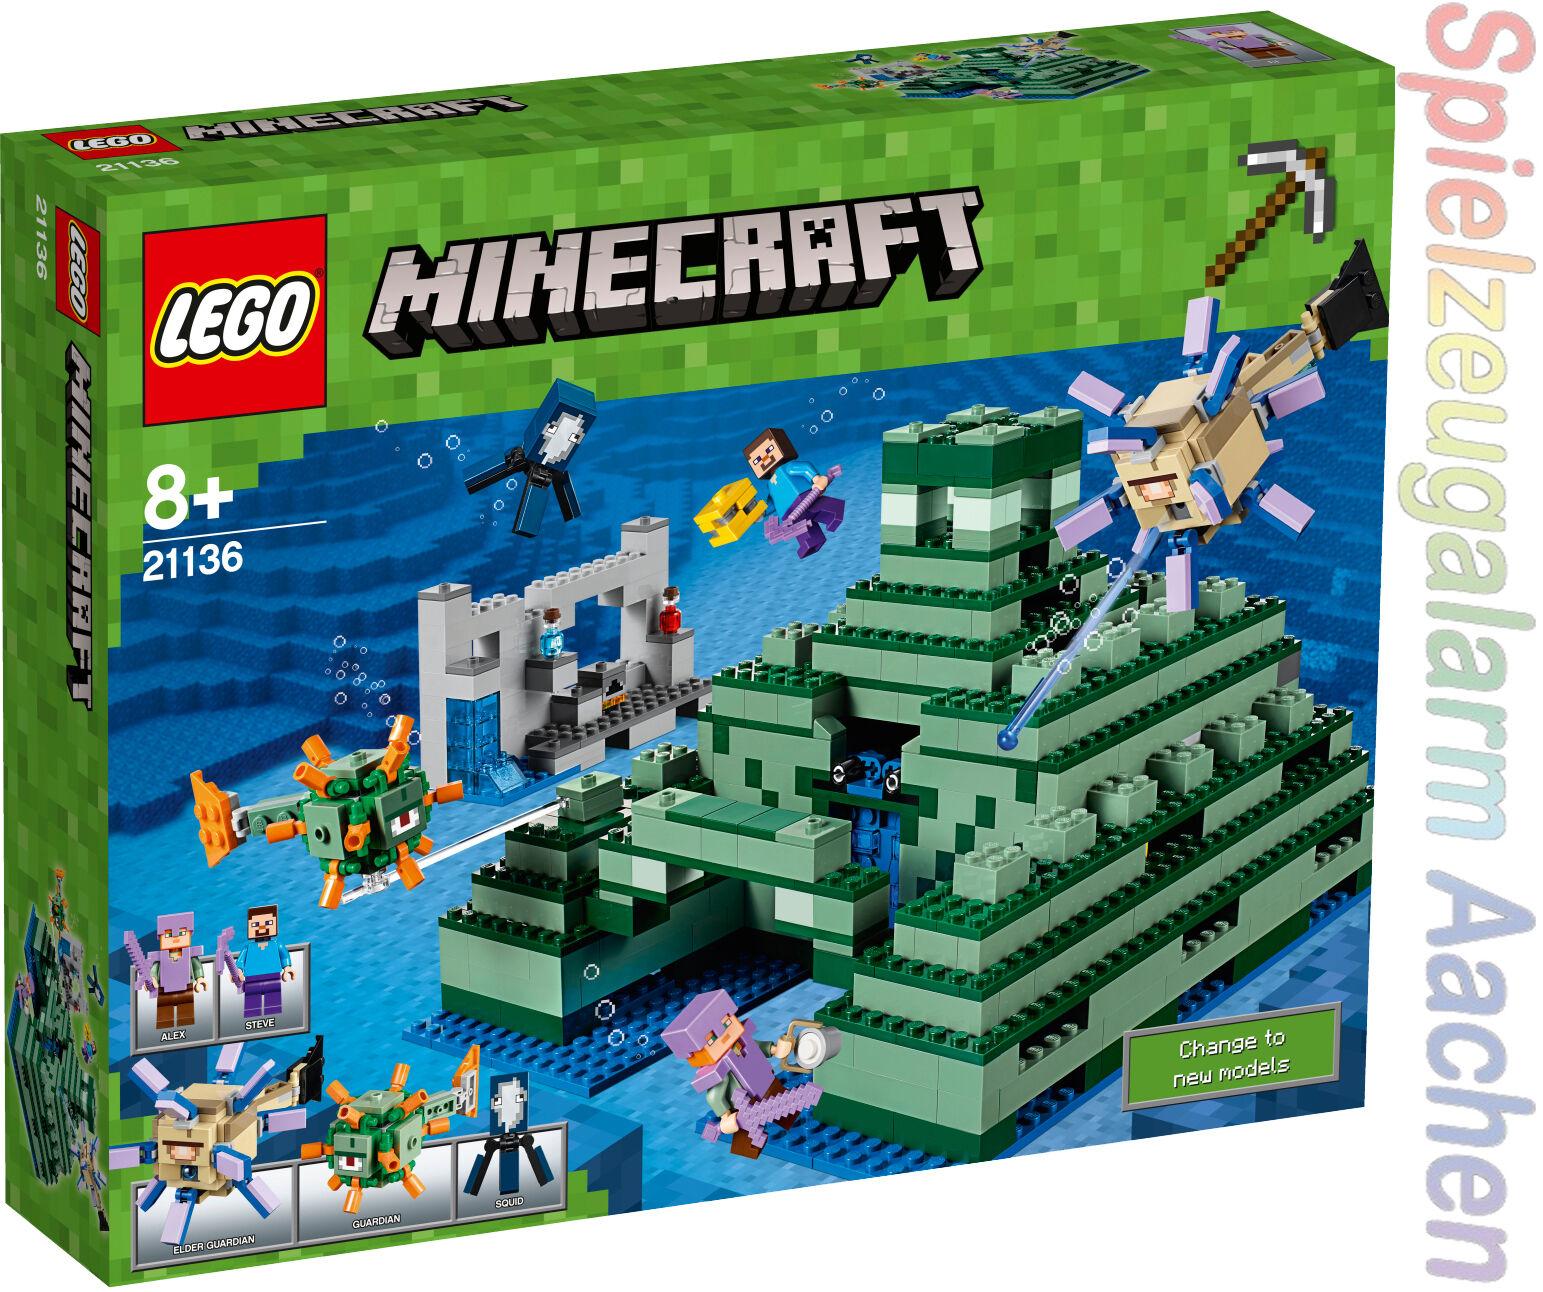 LEGO 21136 Minecraft Ozeanmonument Monumento oceánico Monument sous-marin N9 17